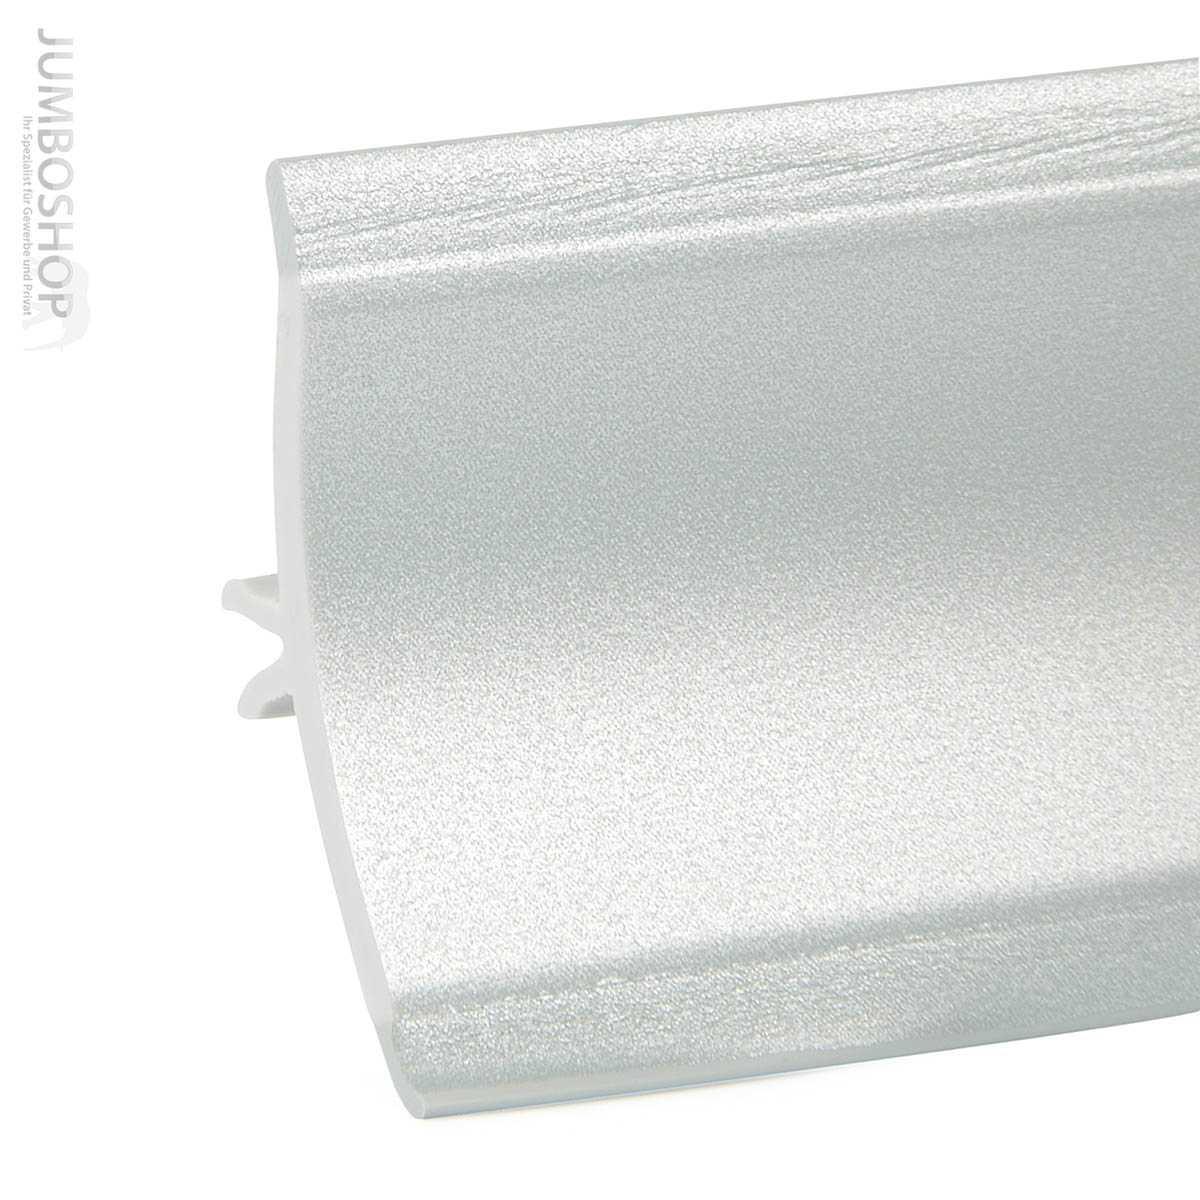 Wandabschlussleiste Küche Alu | Abschlussleiste Kuche Arbeitsplatte Kuchenleiste Aluminium